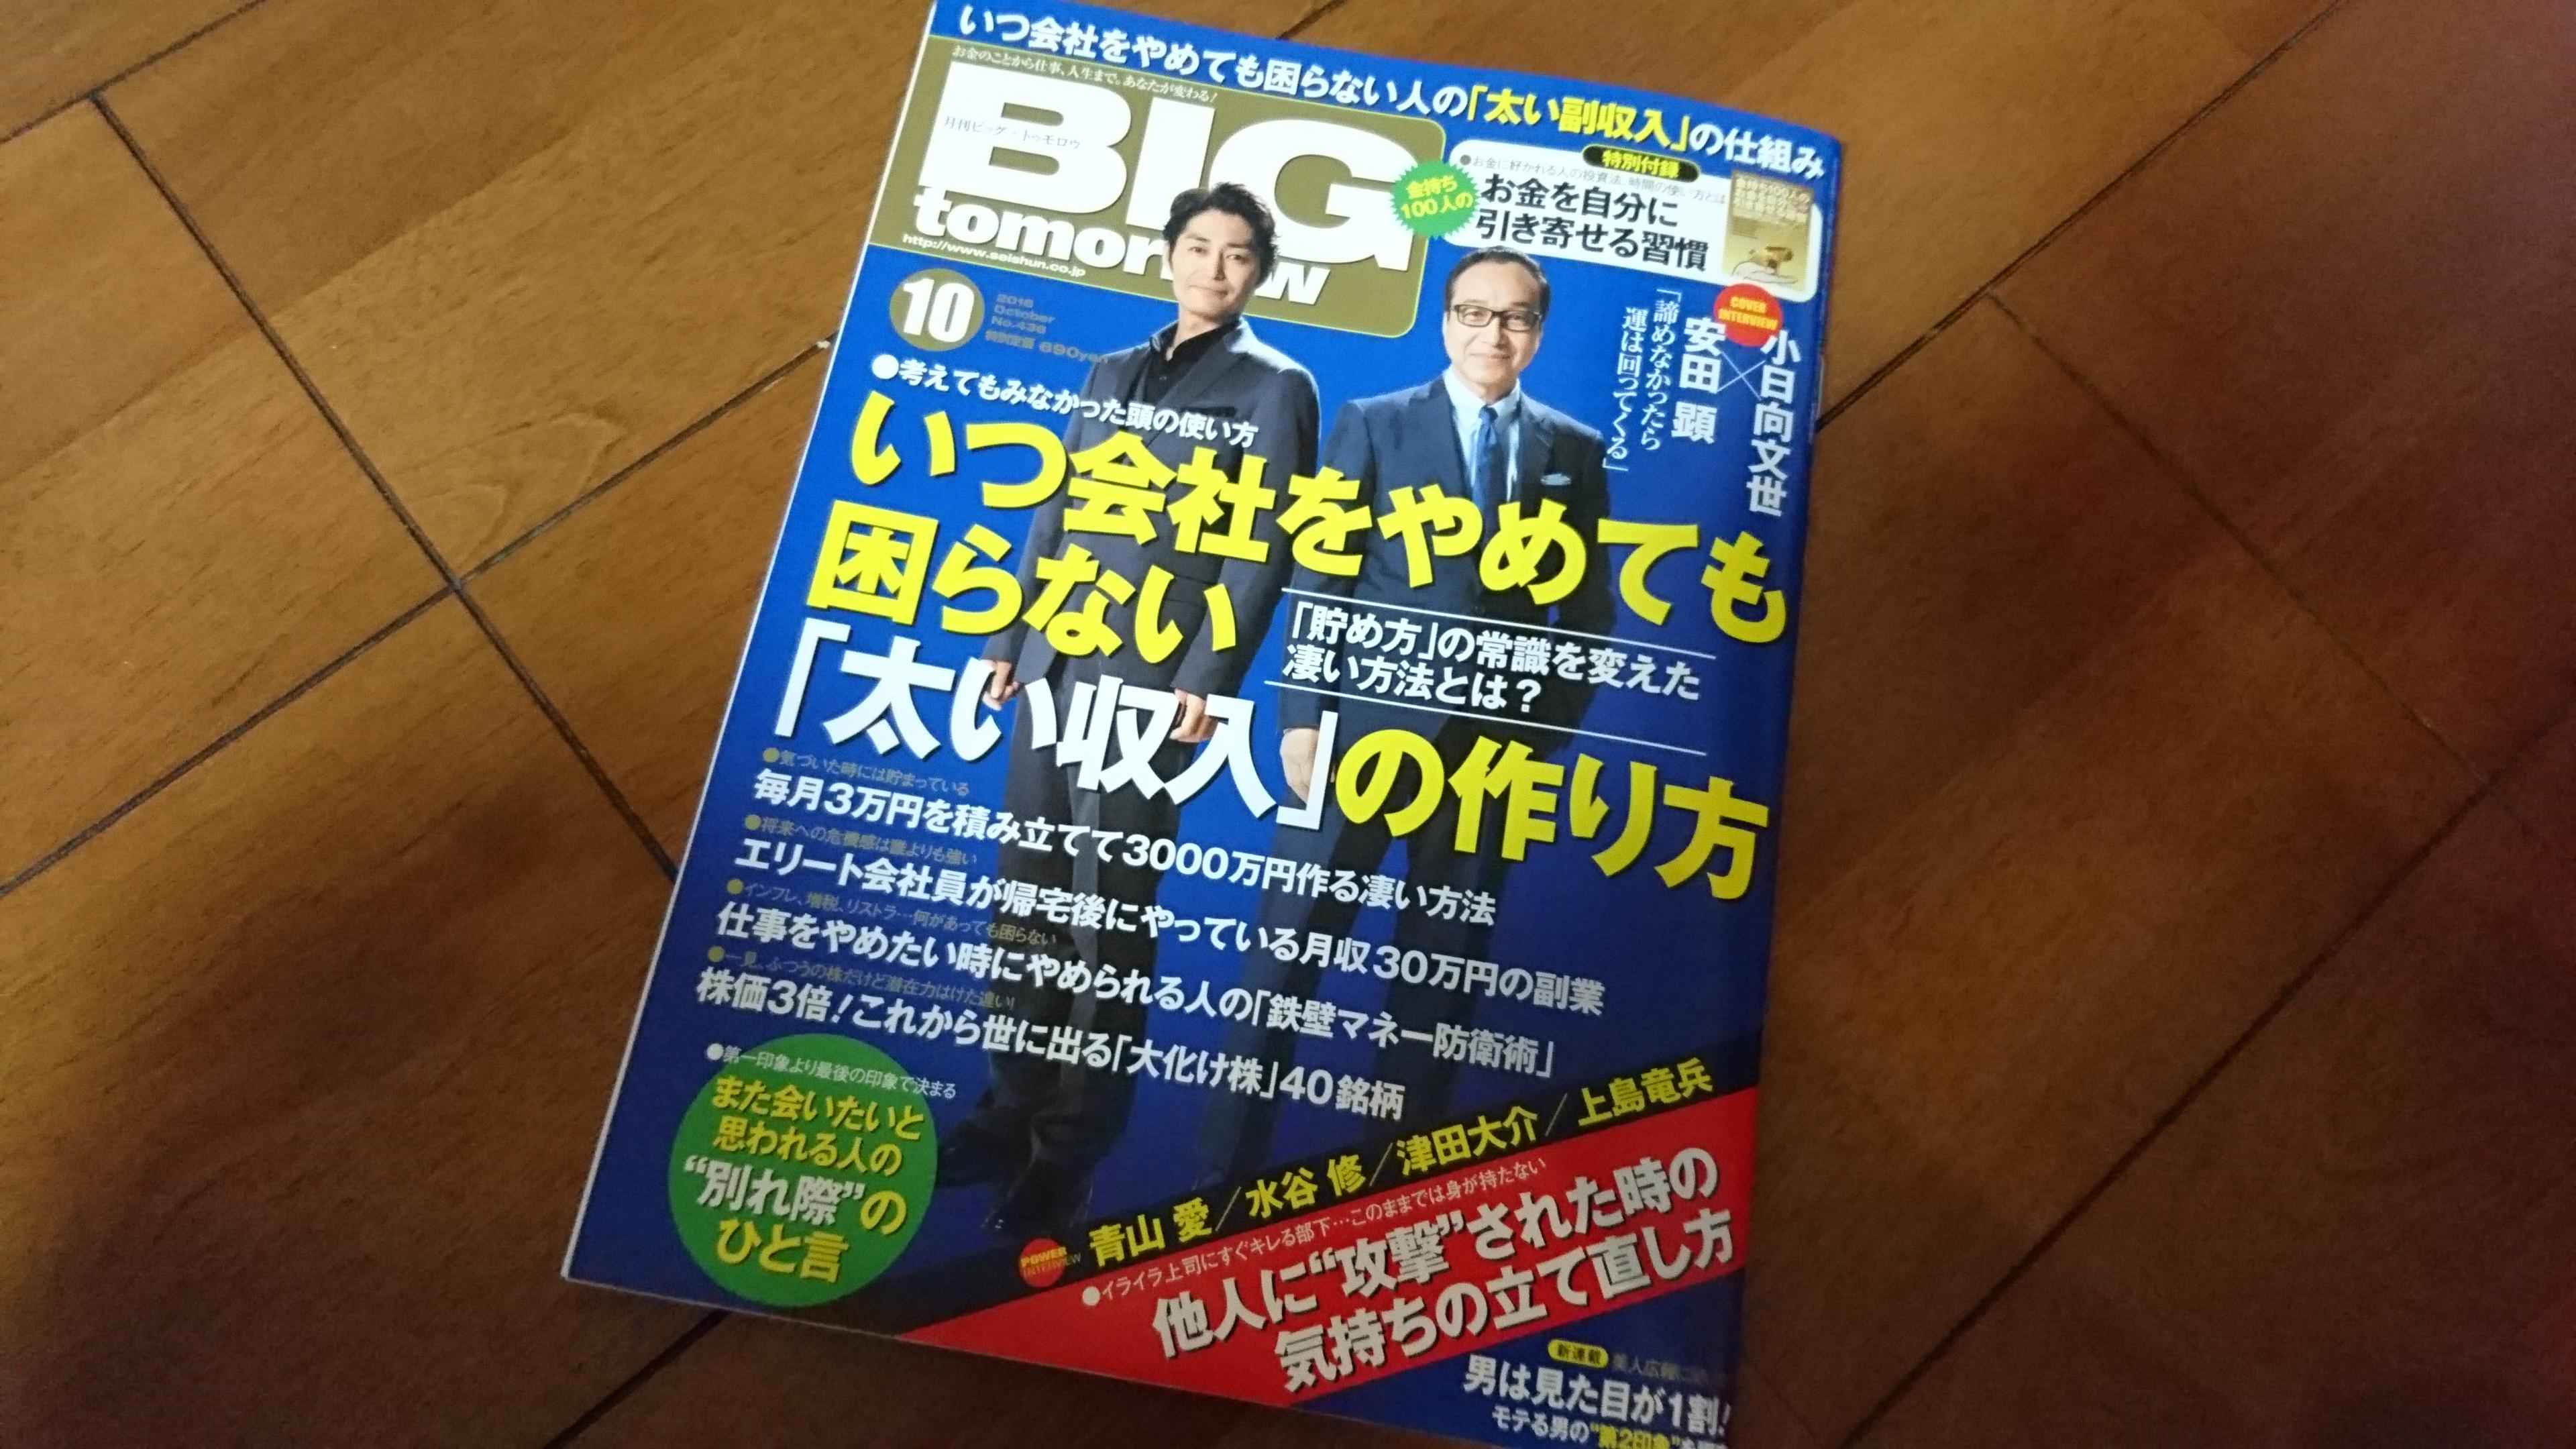 bigtomorrow01